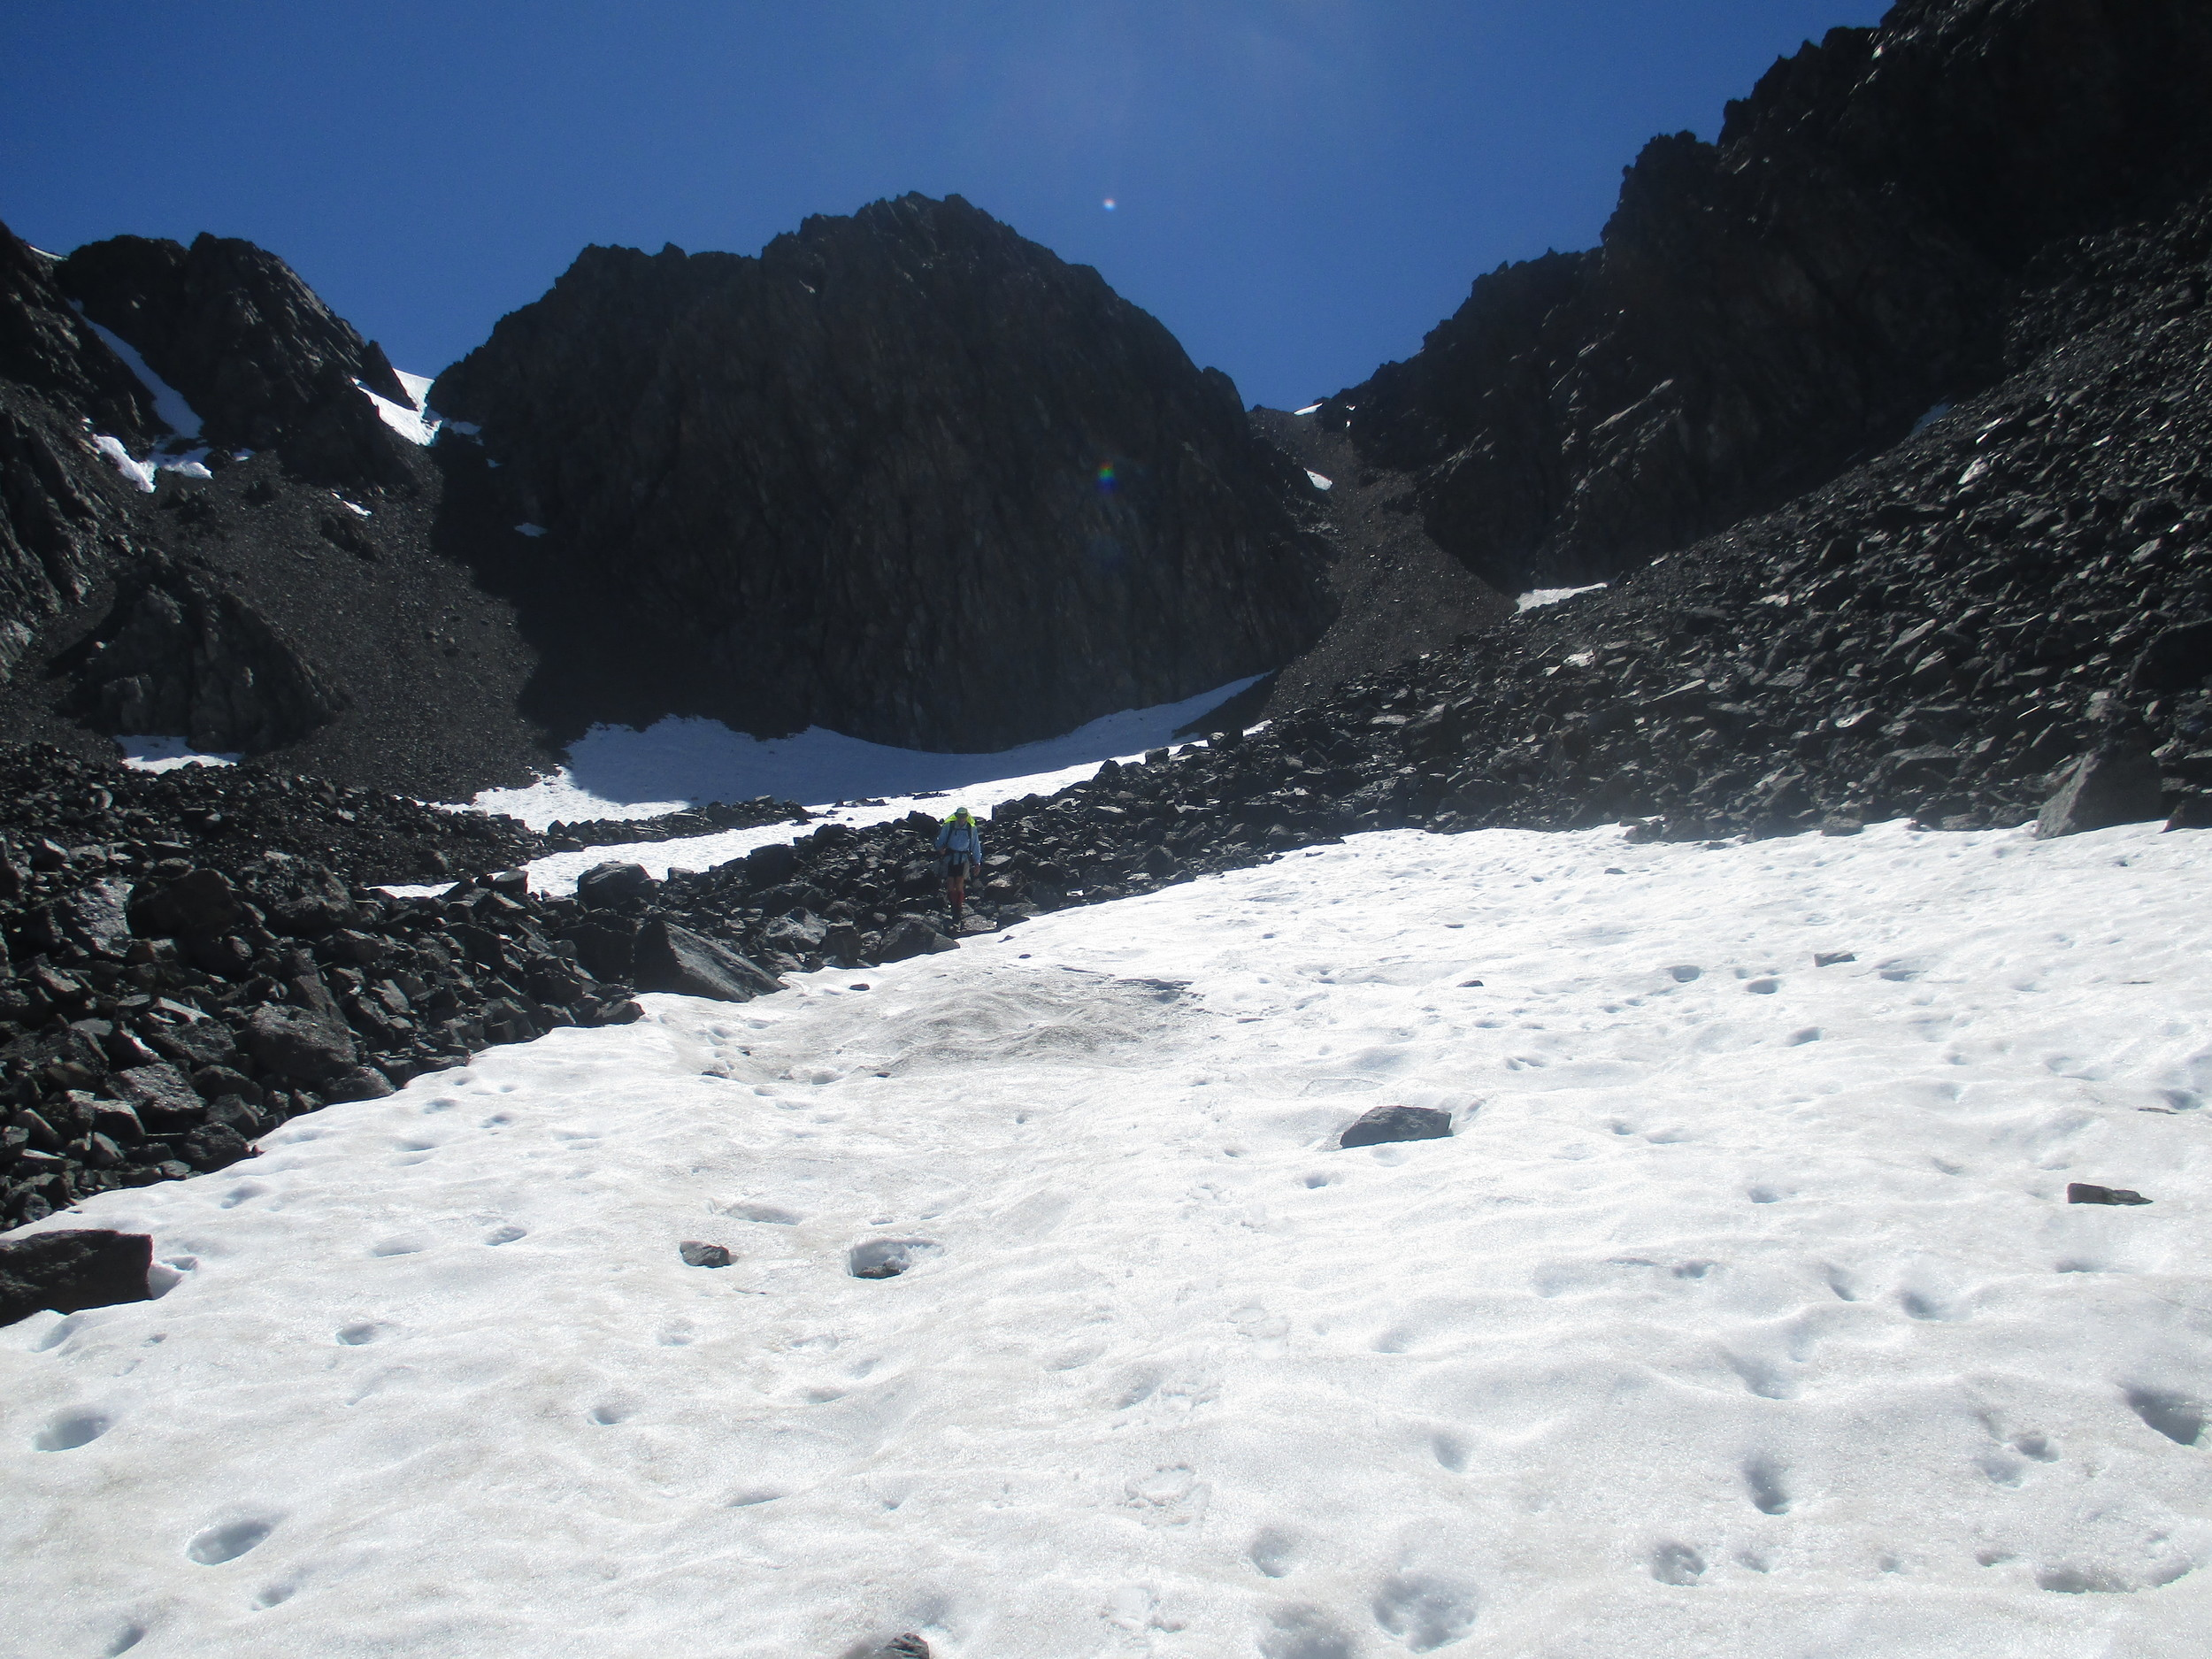 Al on Tappy , big mountain